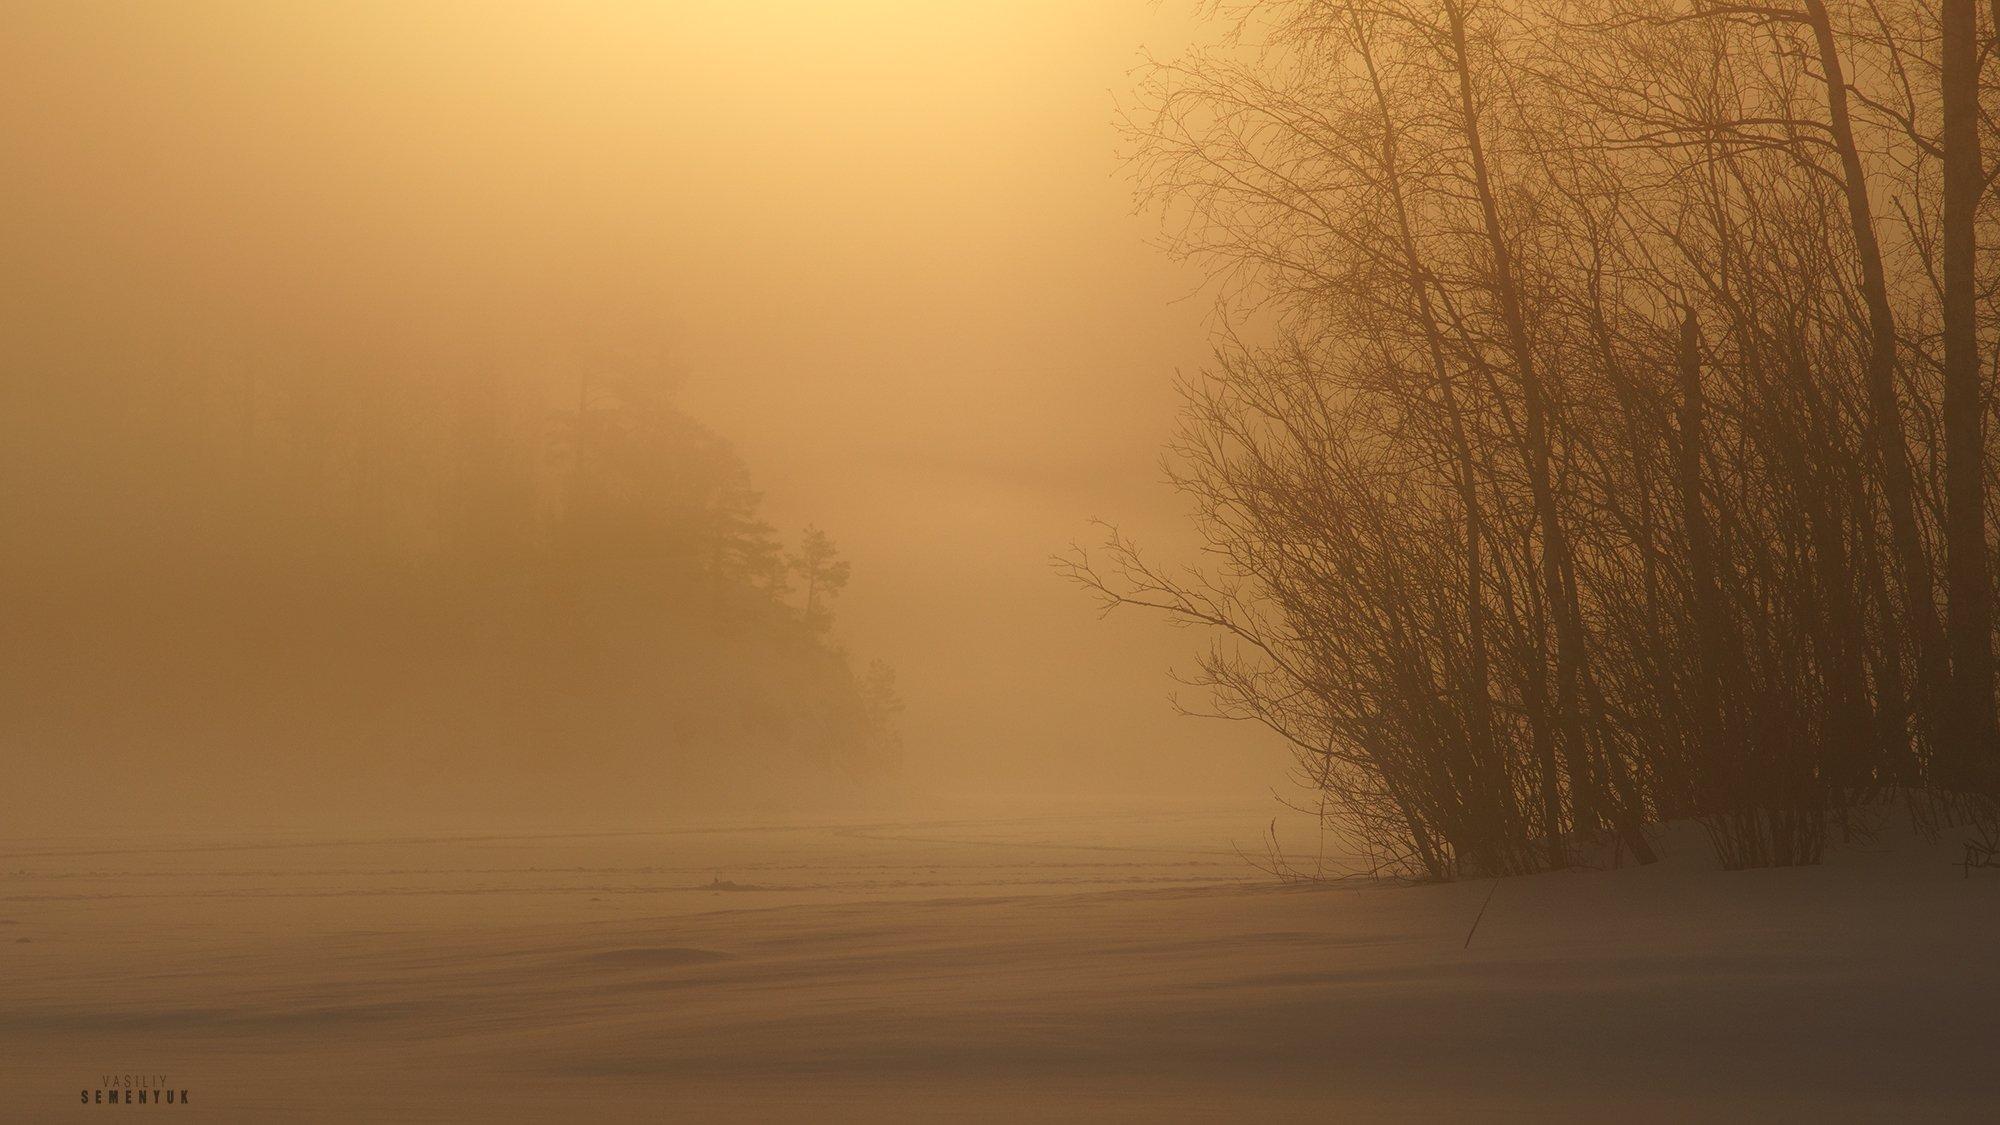 ладога, зима, туман, рассвет, острова, деревья, минимализм, снег, ladoga, lake, winter, fog, ice, snow, sunrise, minimalism., Семенюк Василий